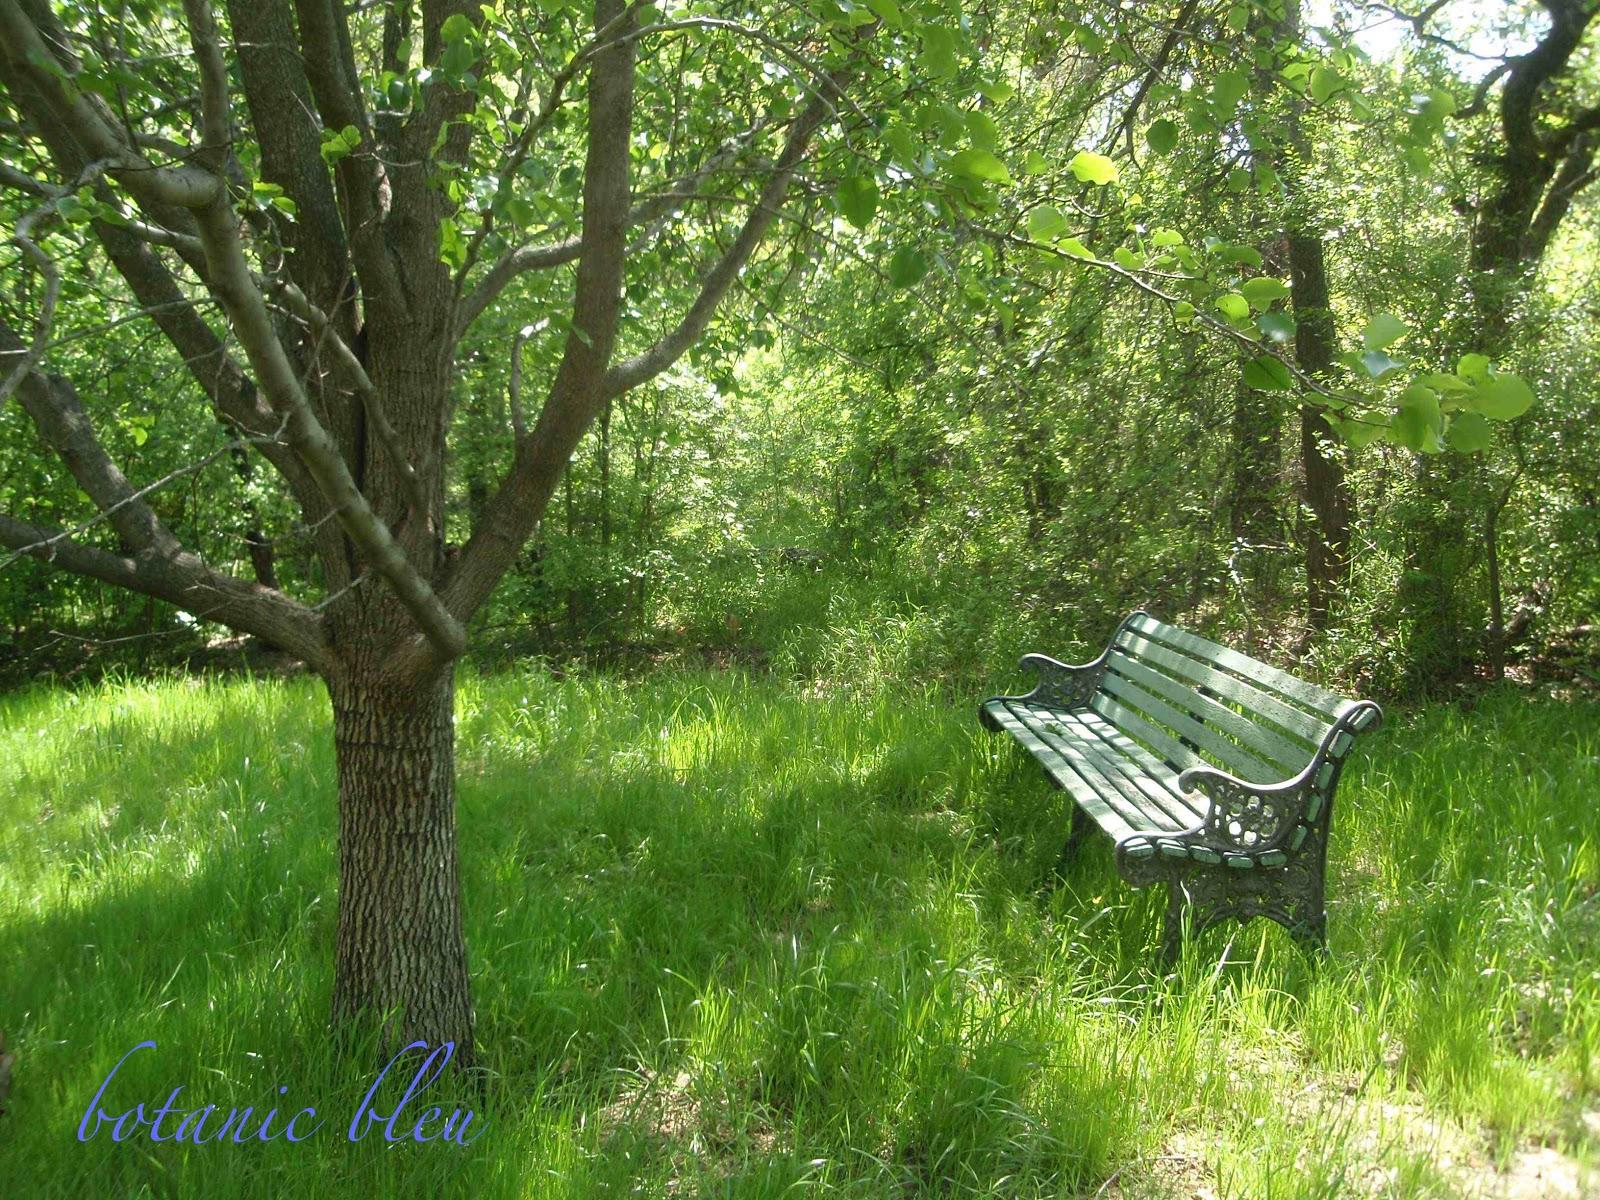 Botanic Bleu Vintage Park Bench